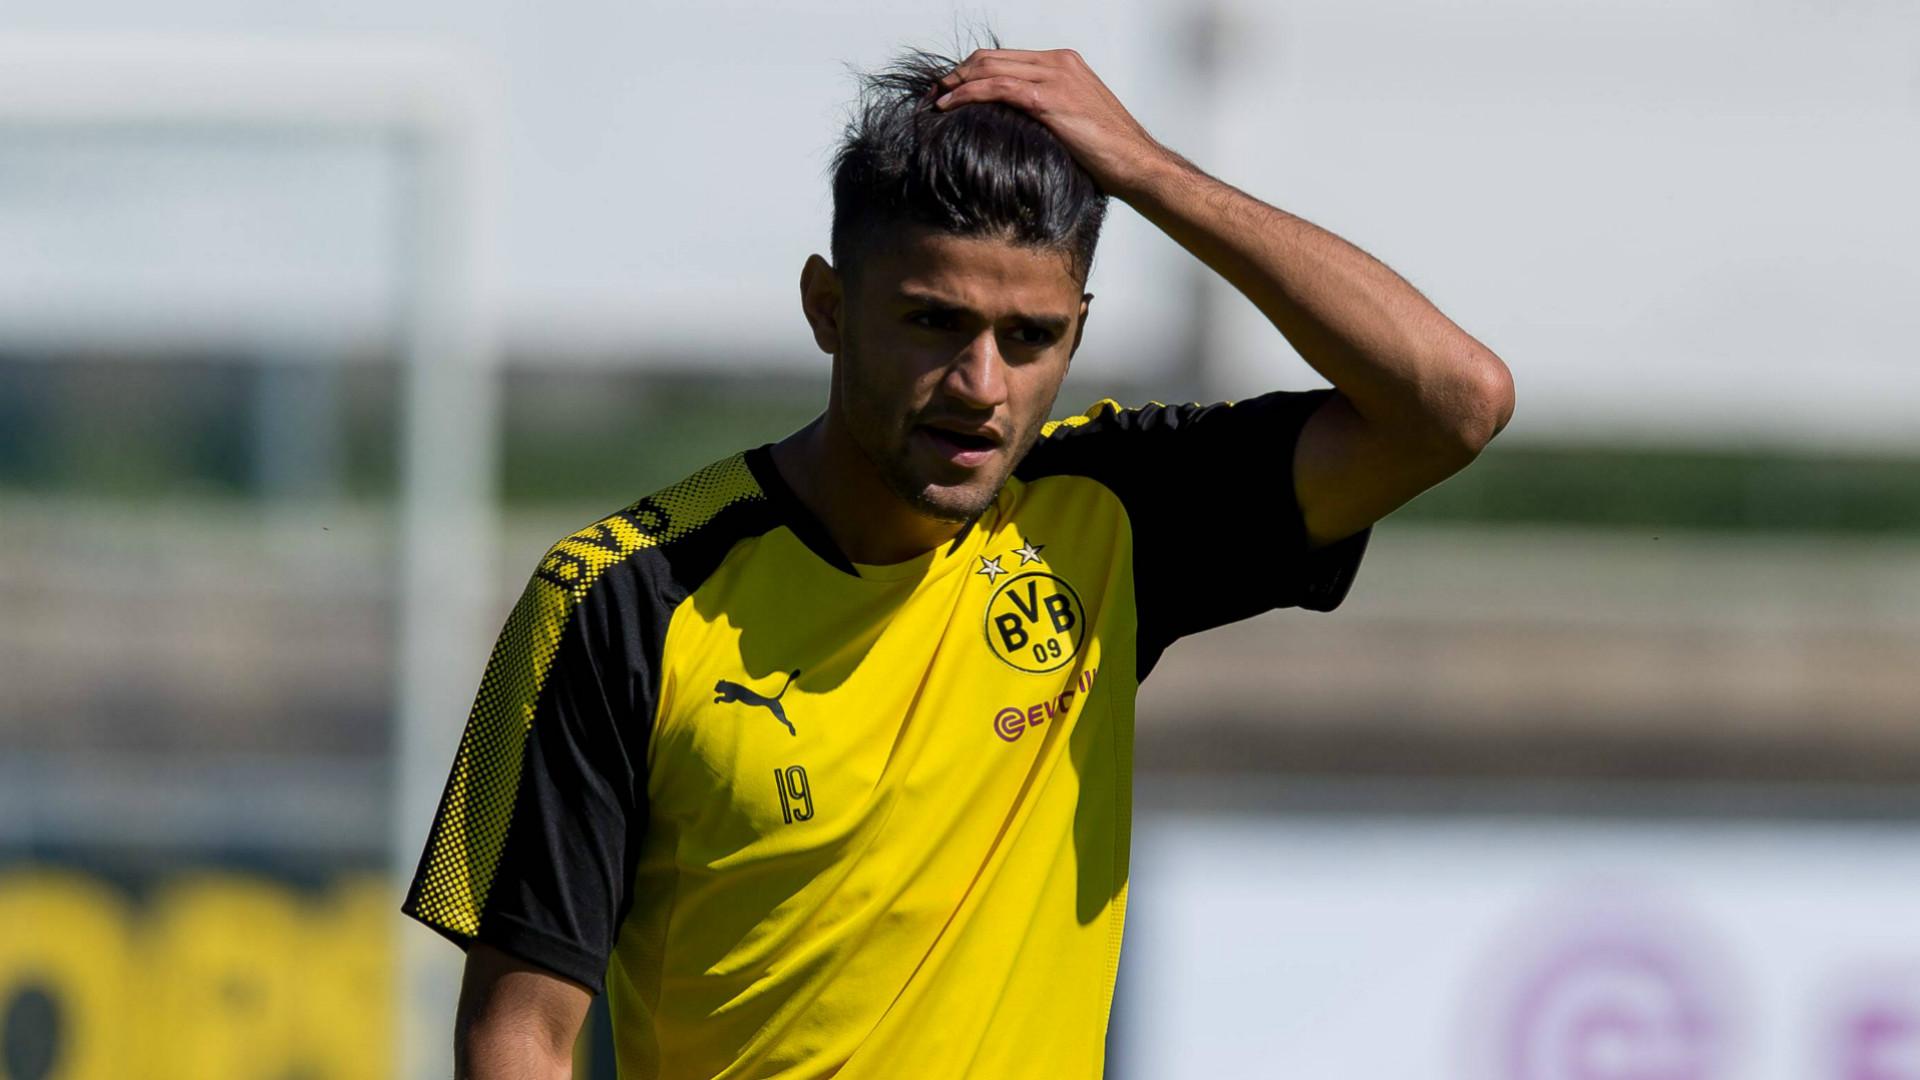 Entwarnung bei Dahoud: Jungprofi ist zurück im BVB-Training